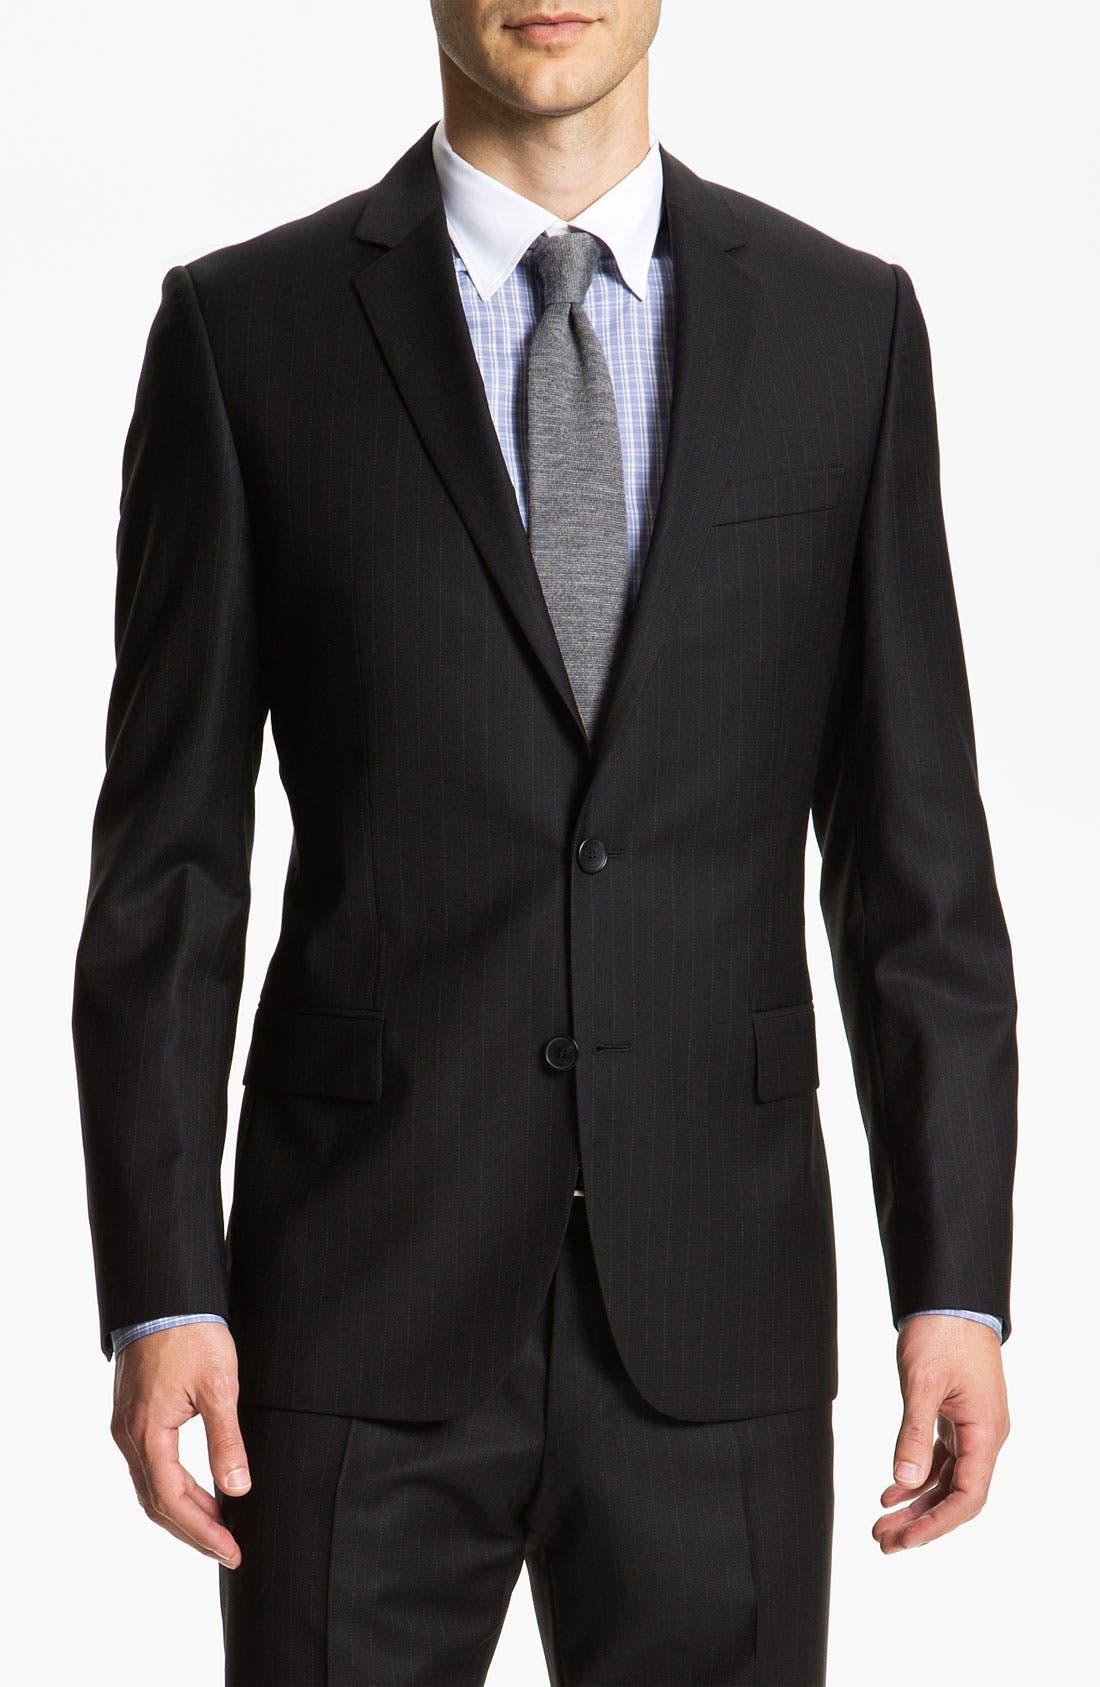 Alternate Image 1 Selected - HUGO 'Amaro/Heise' Trim Fit Stripe Suit